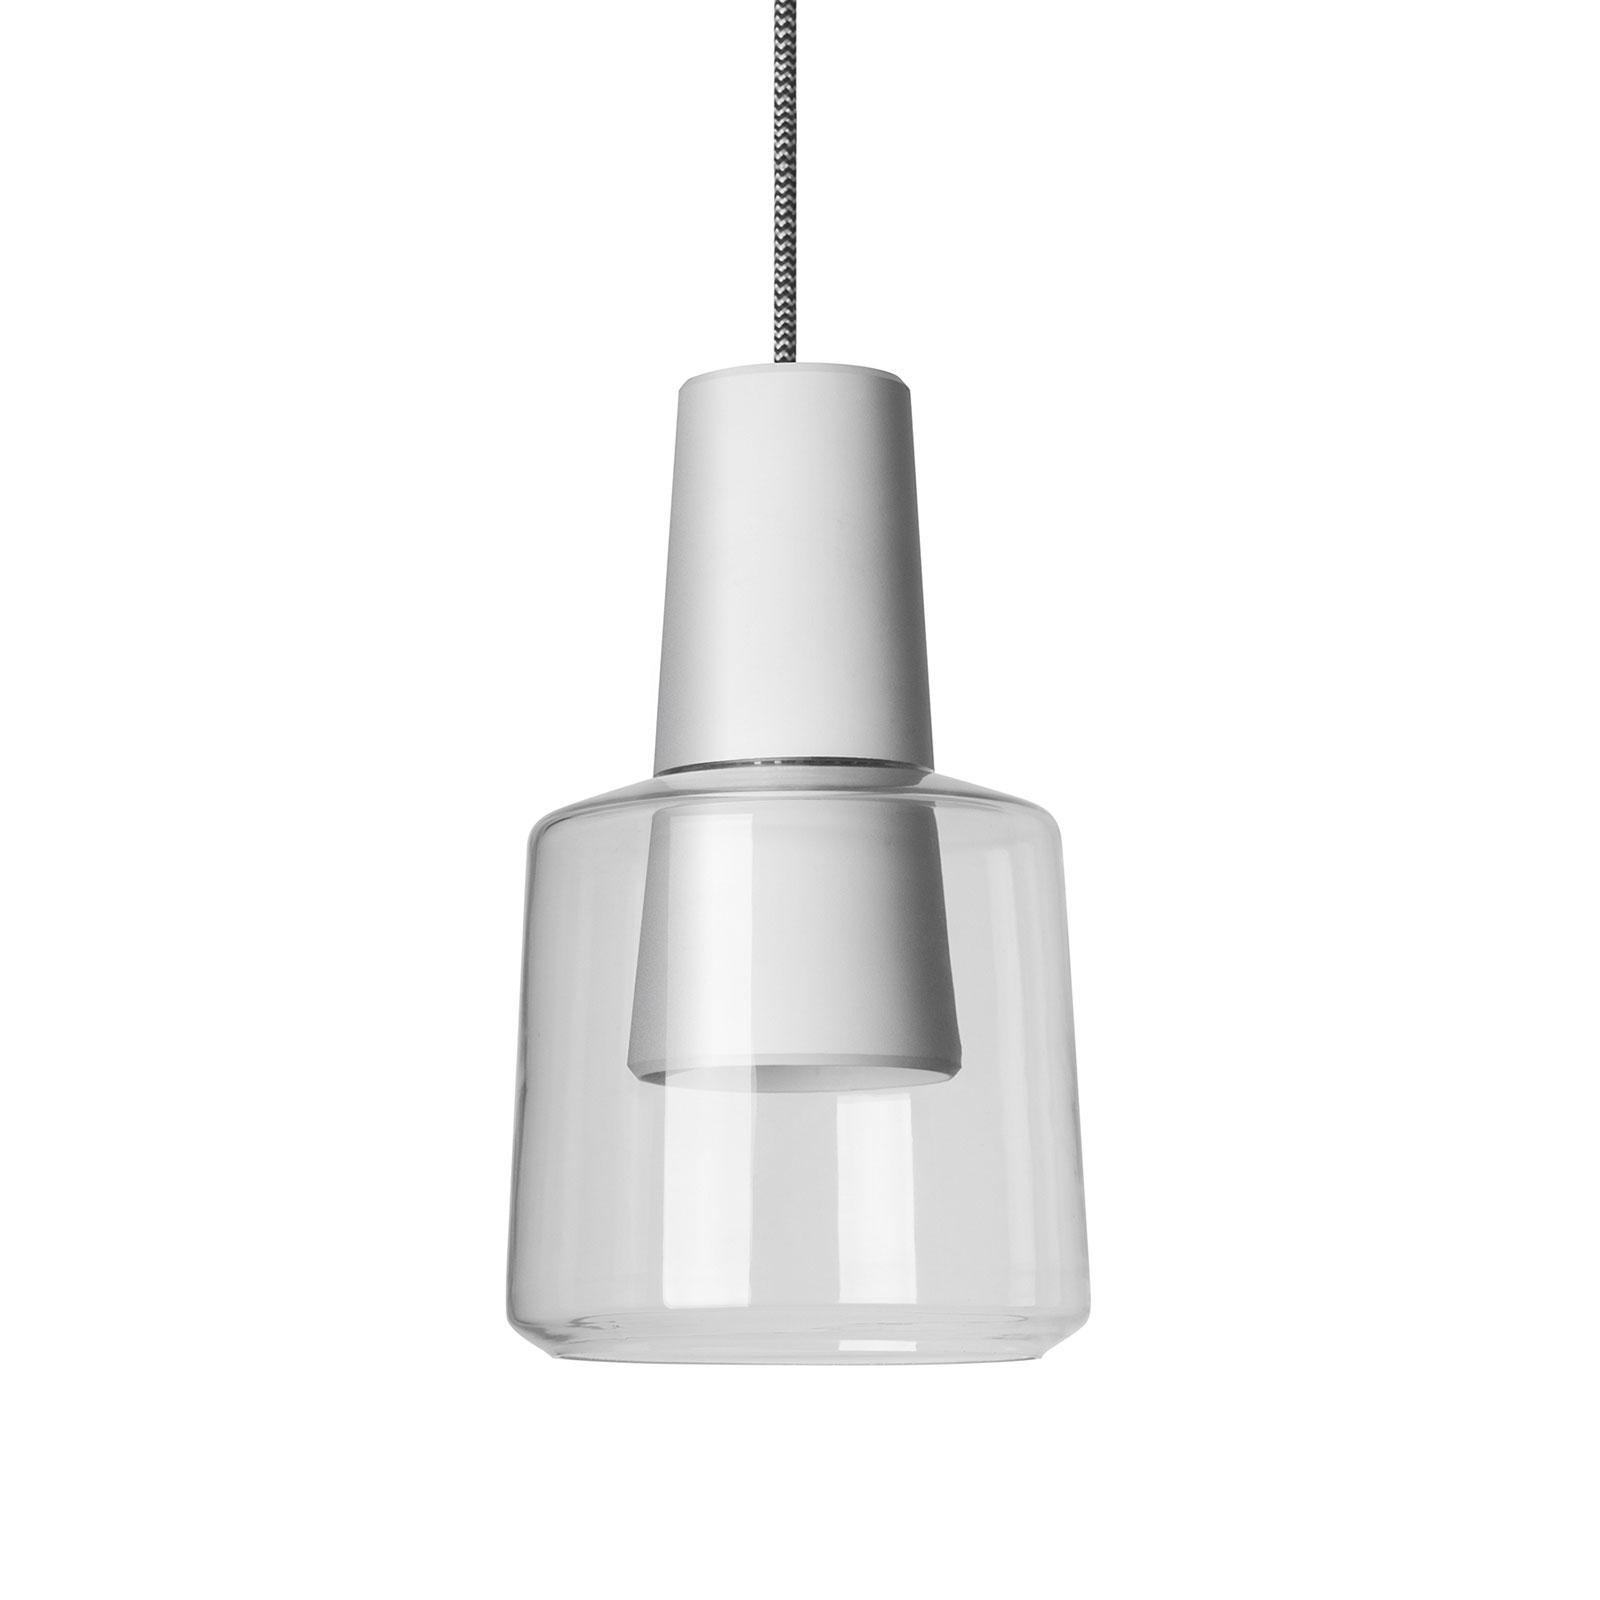 LEDS-C4 Khoi Surfaced -riippuvalo kirkas/valkoinen